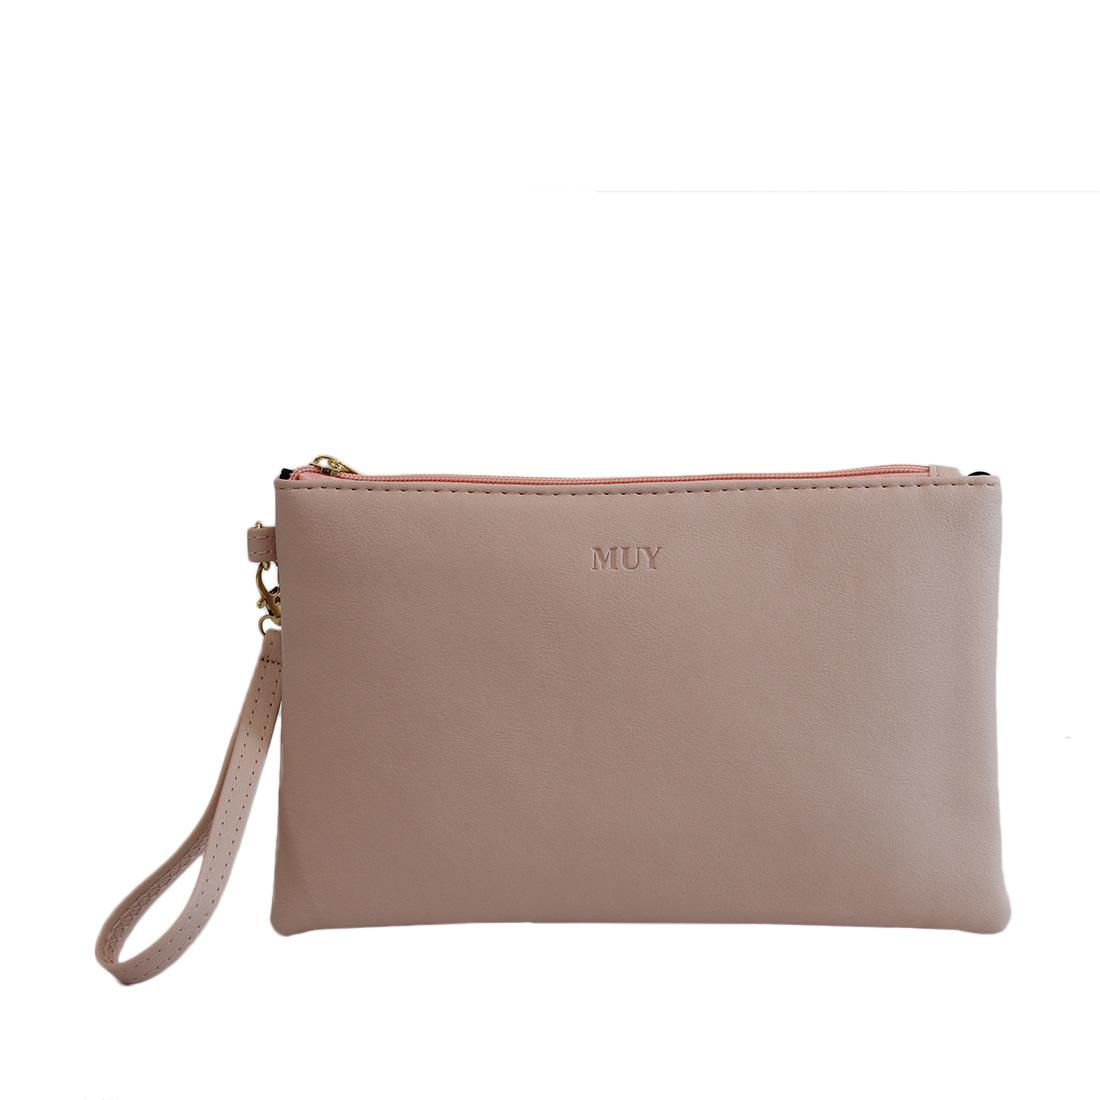 Plain design with attachable strap